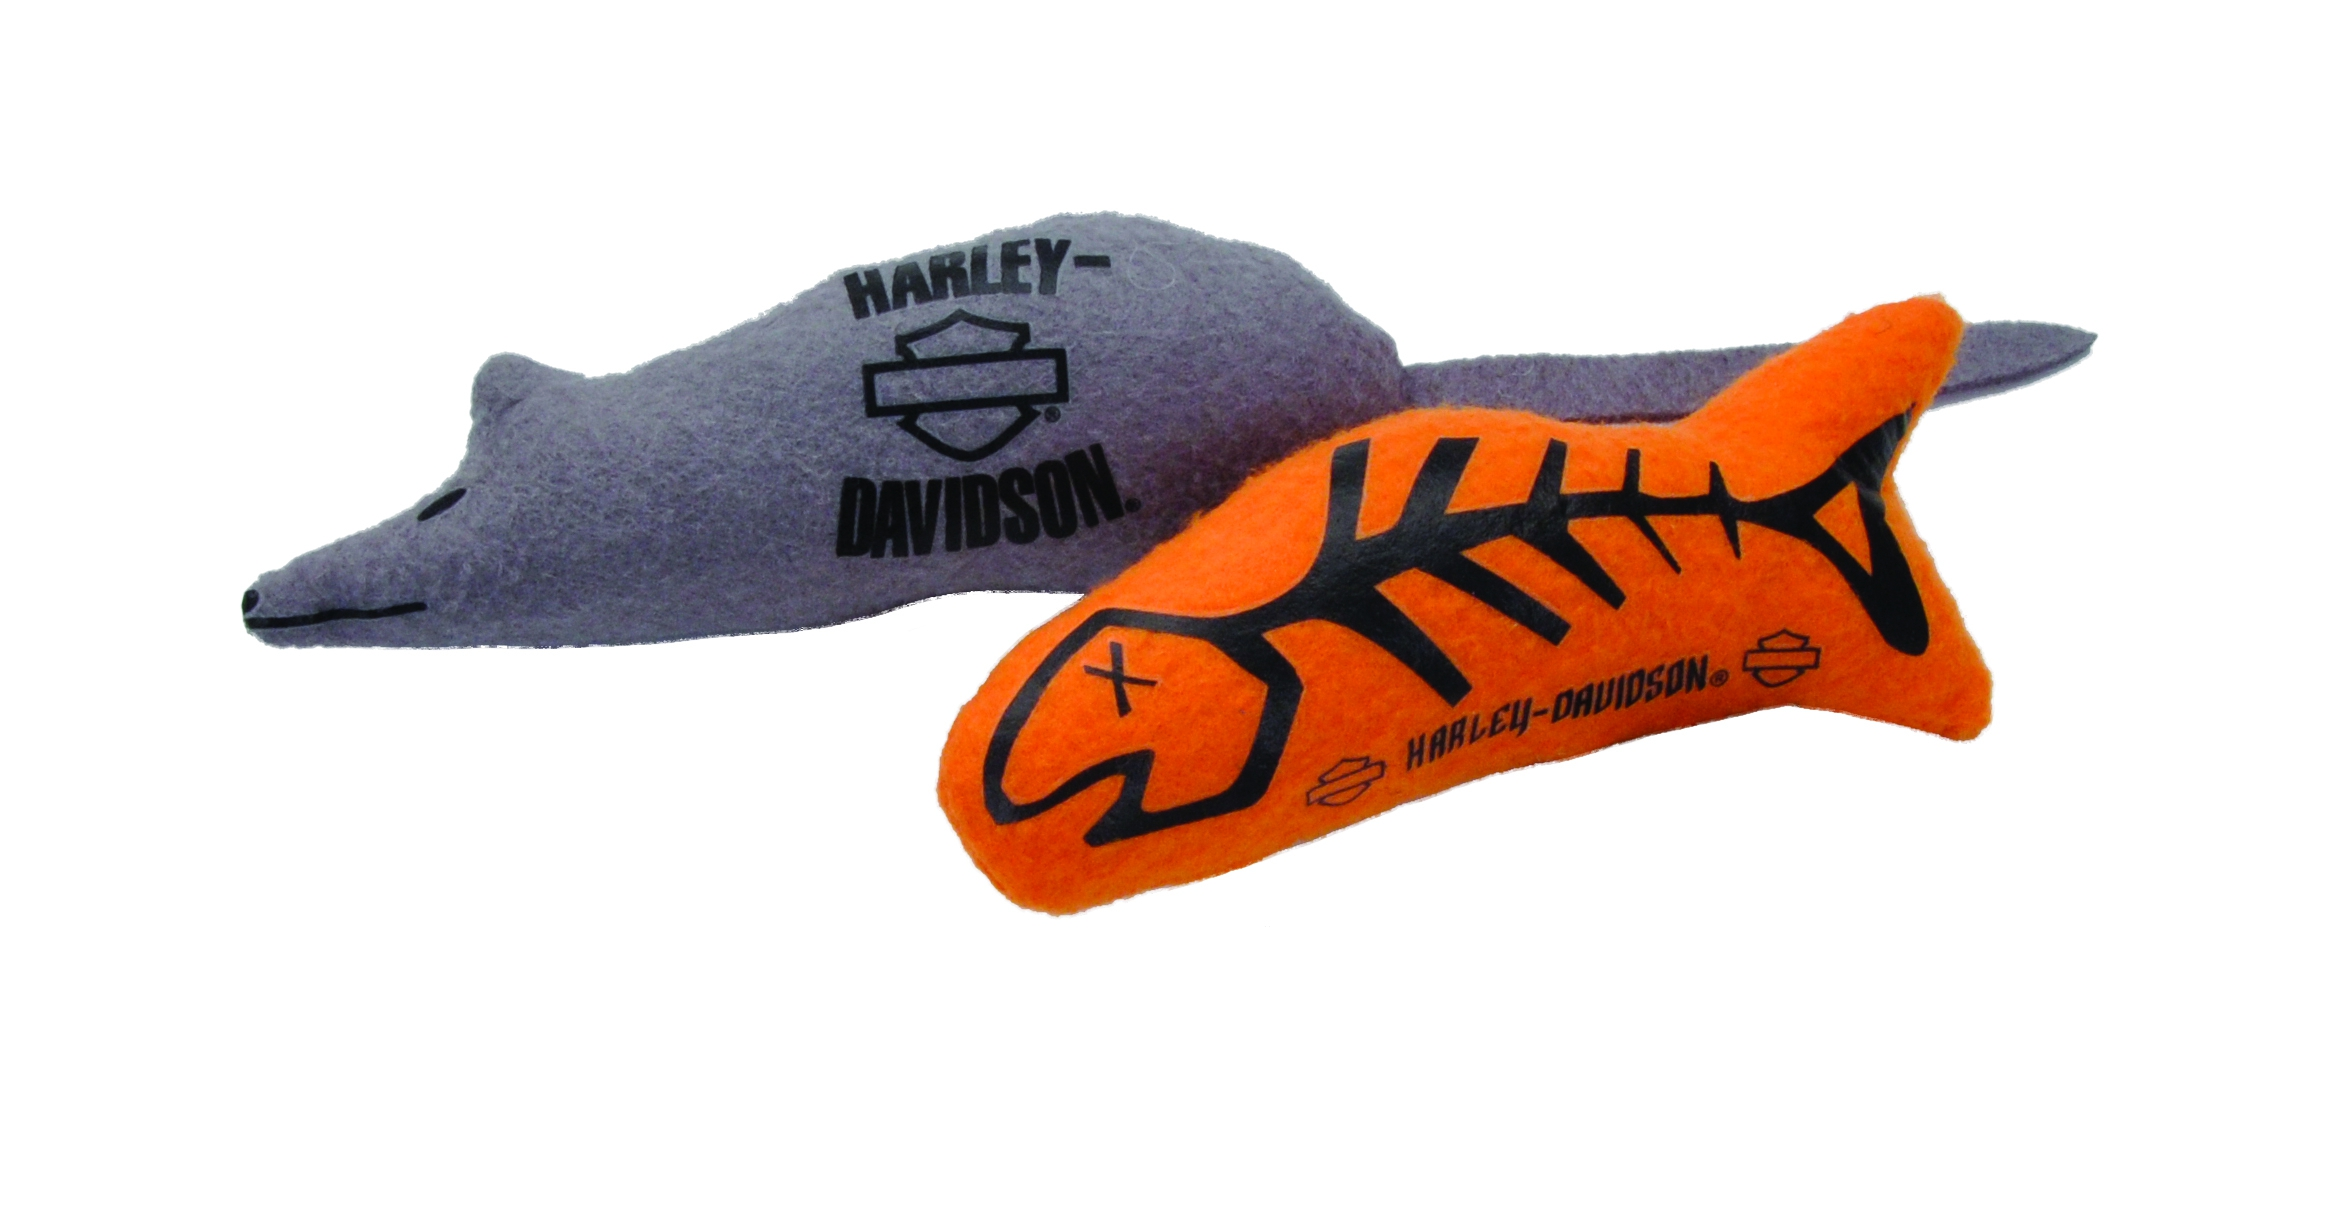 Harley-Davidson kissanlelu